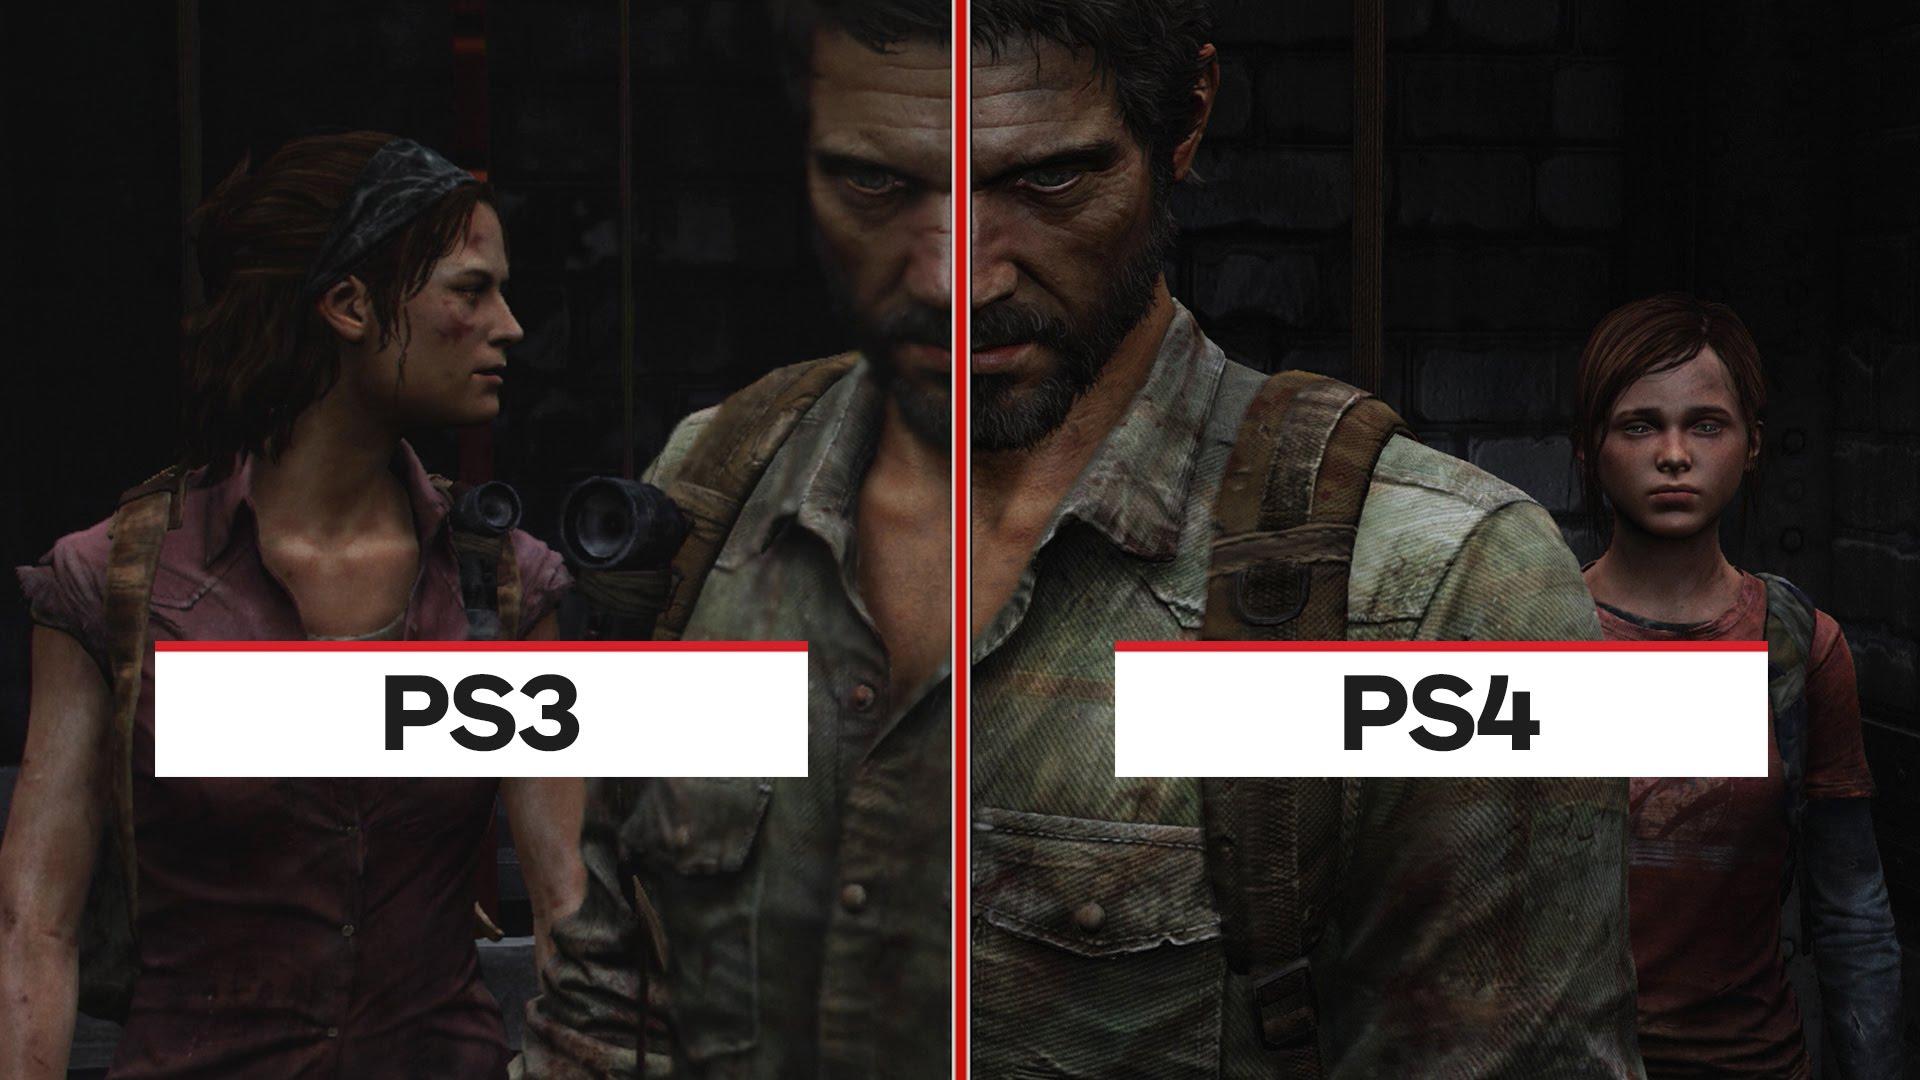 The Last Of Us Wallpaper 1920x1080 52754